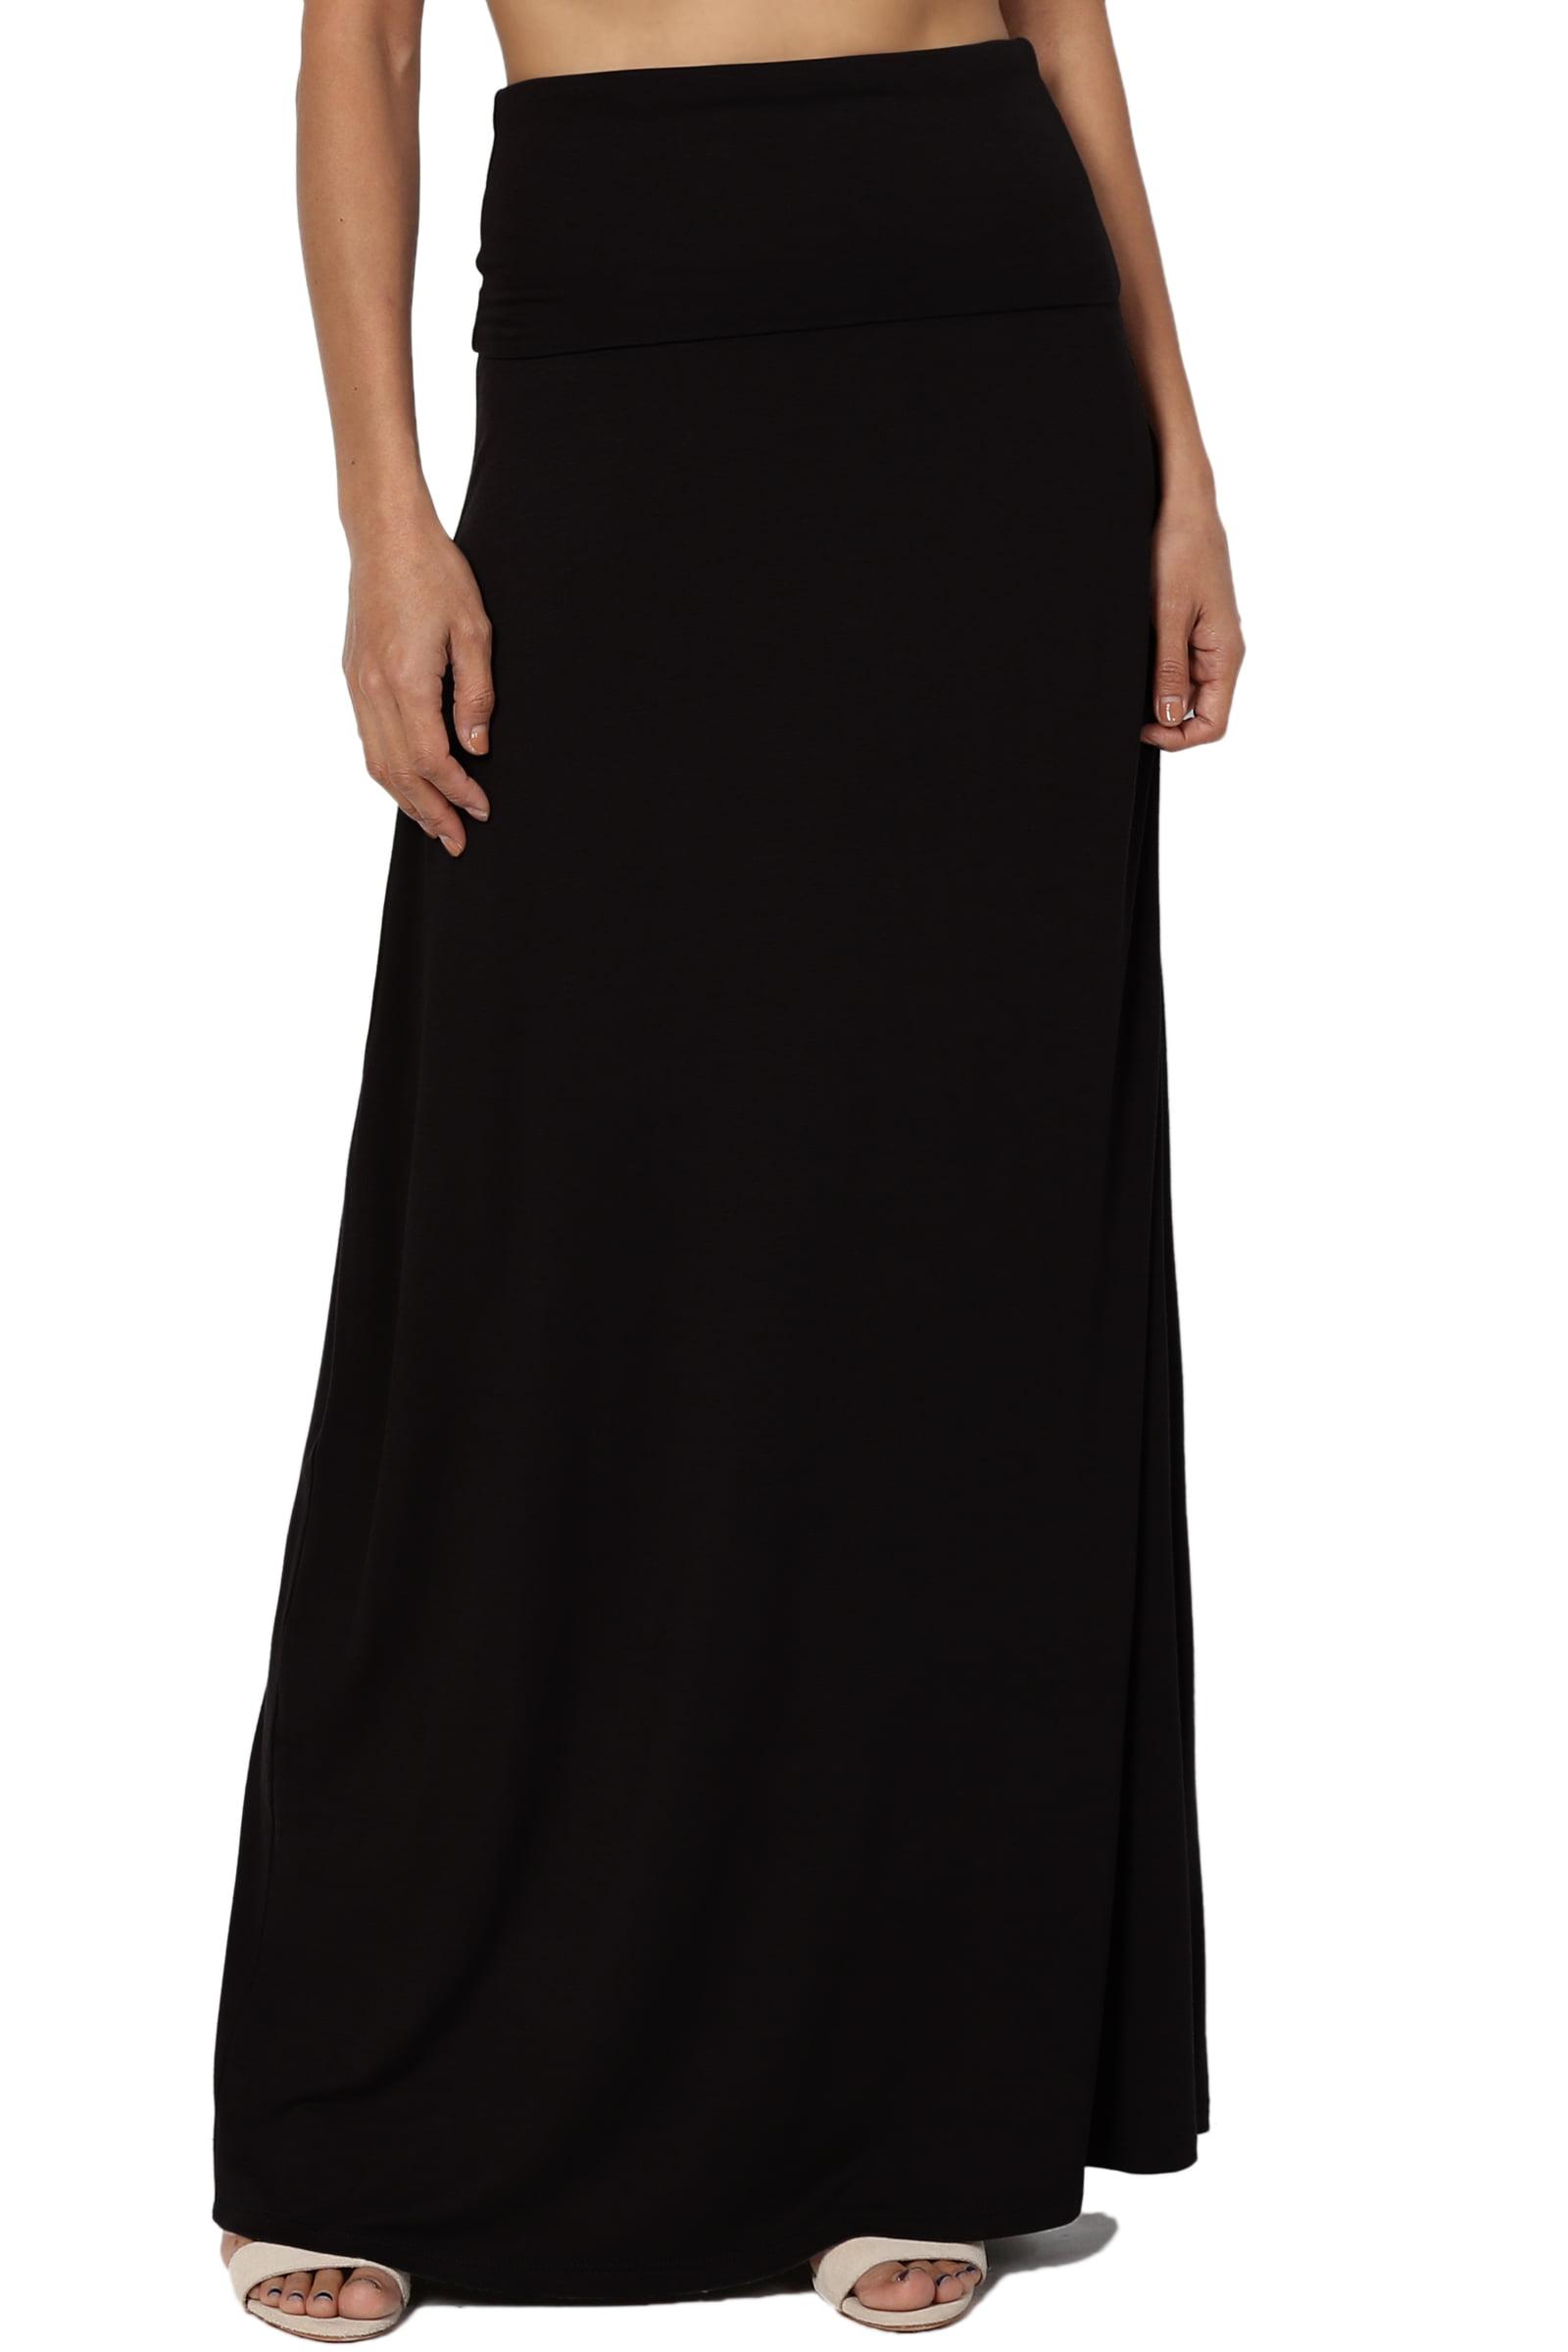 Maroon Double Layer Women Chiffon Retro Long Maxi Dress Elastic Waist Skirt